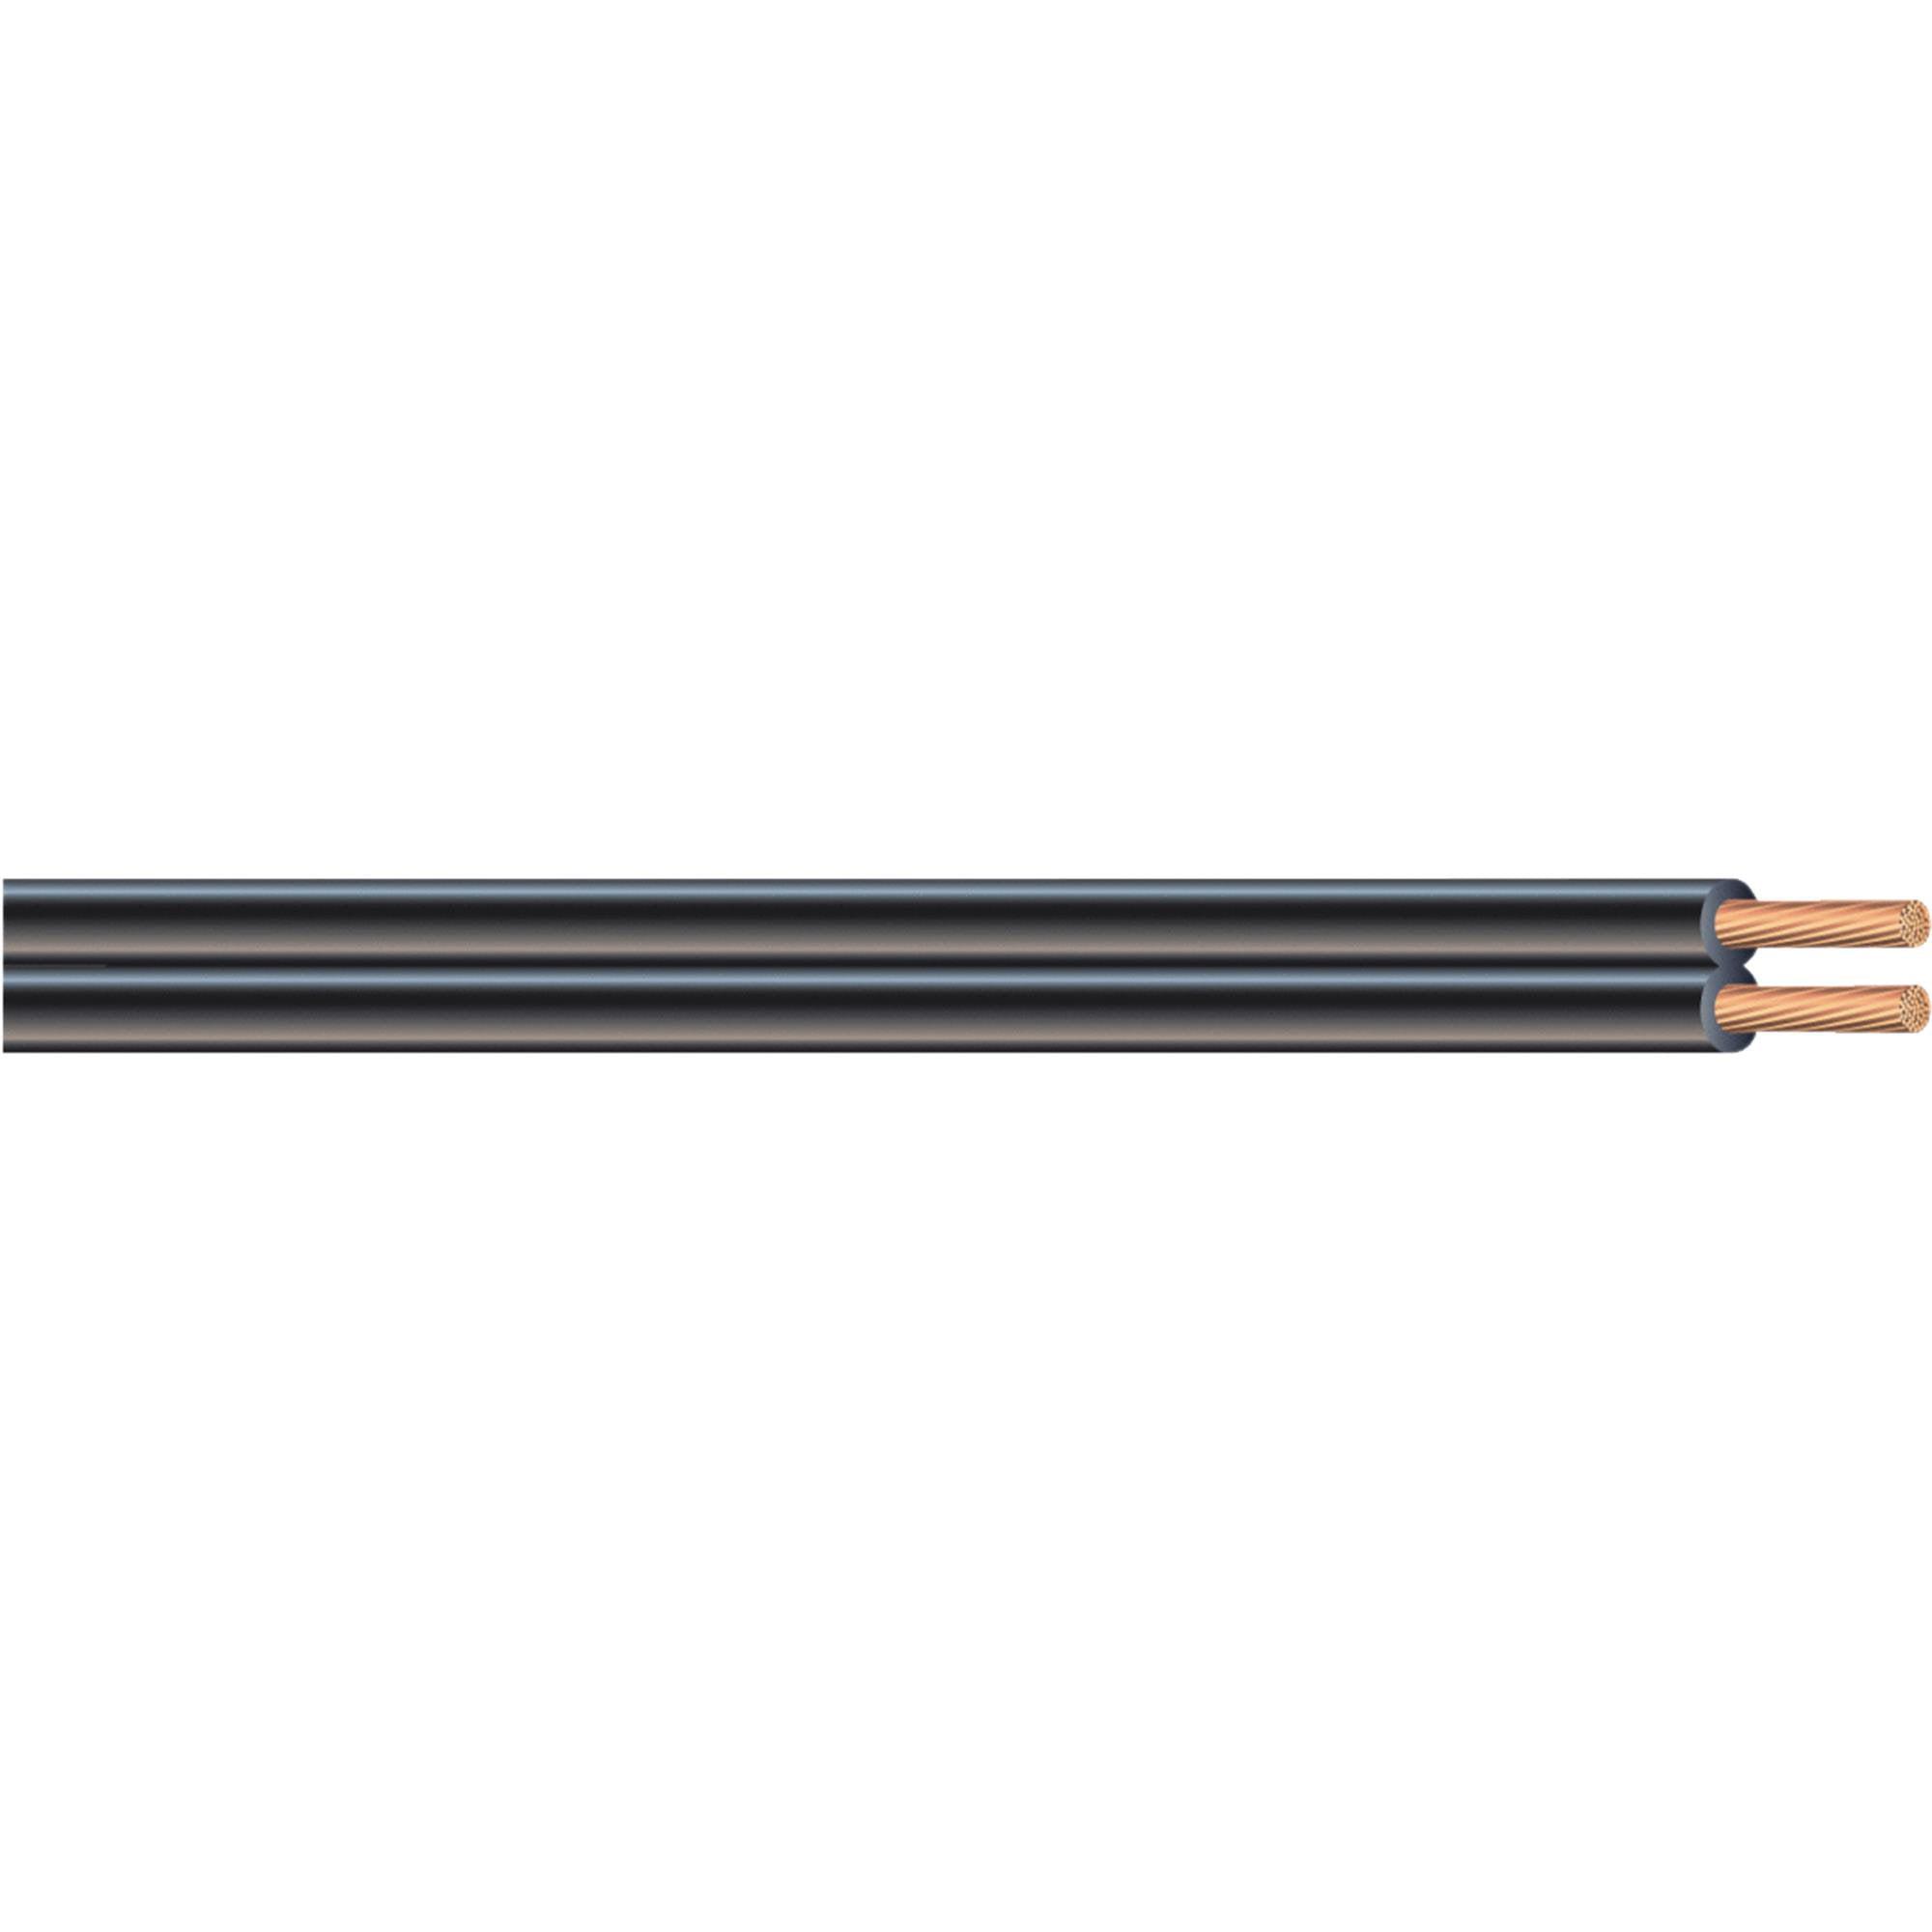 Moonrays 14 2 awg low voltage wire 50 walmart com